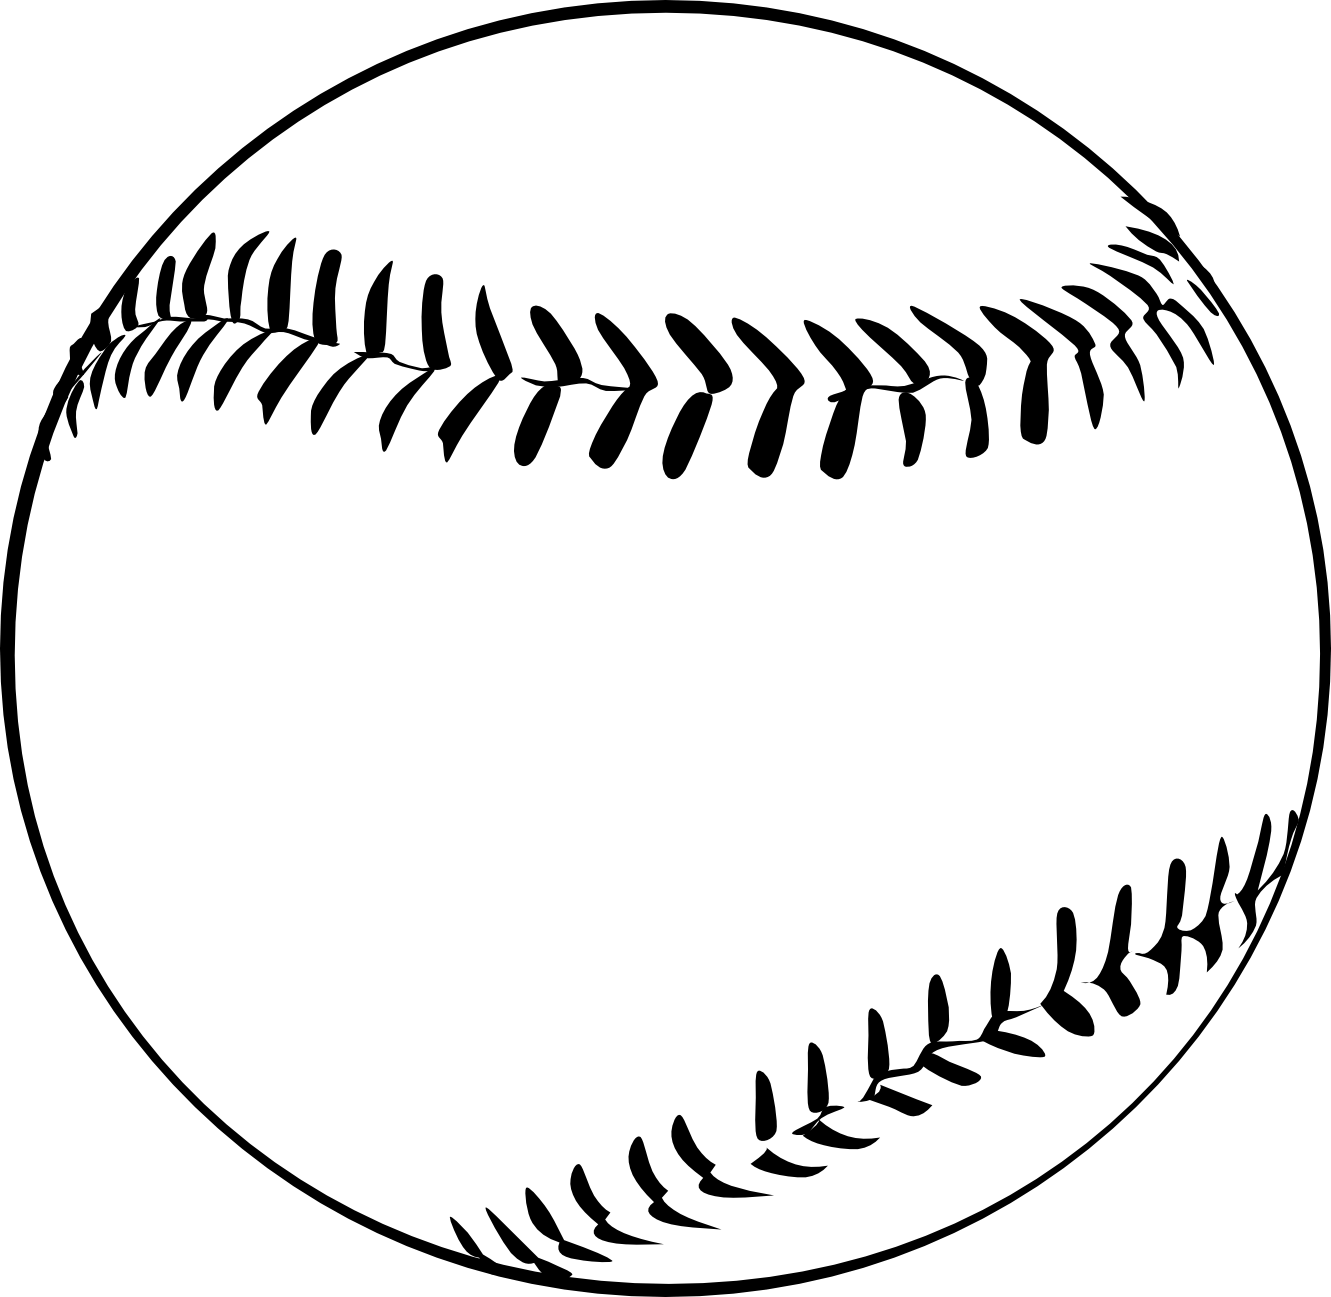 Baseball Hat Clipart Black And White